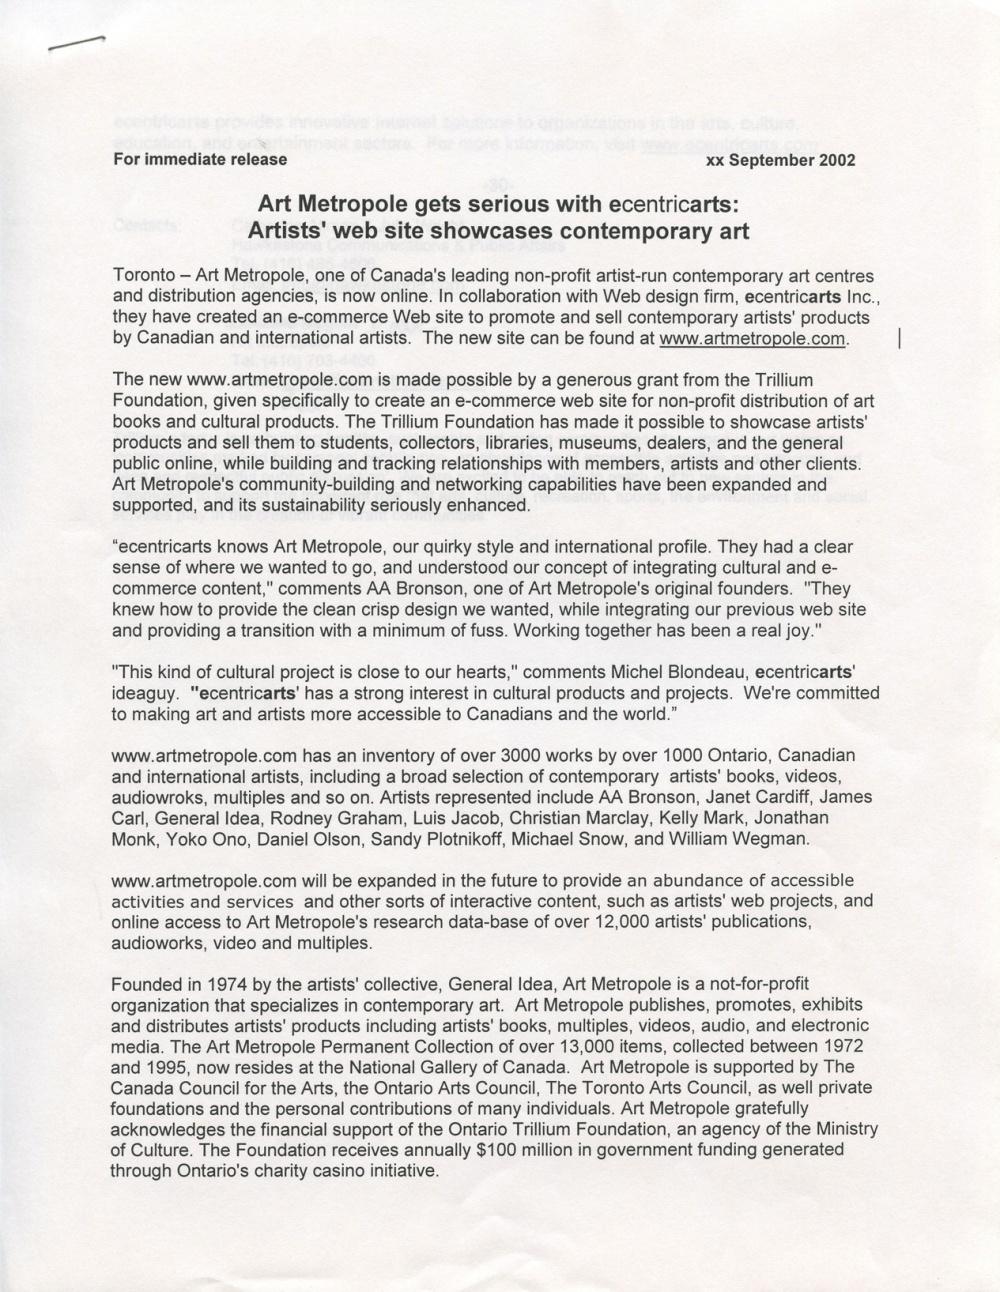 AMA0201, page 1